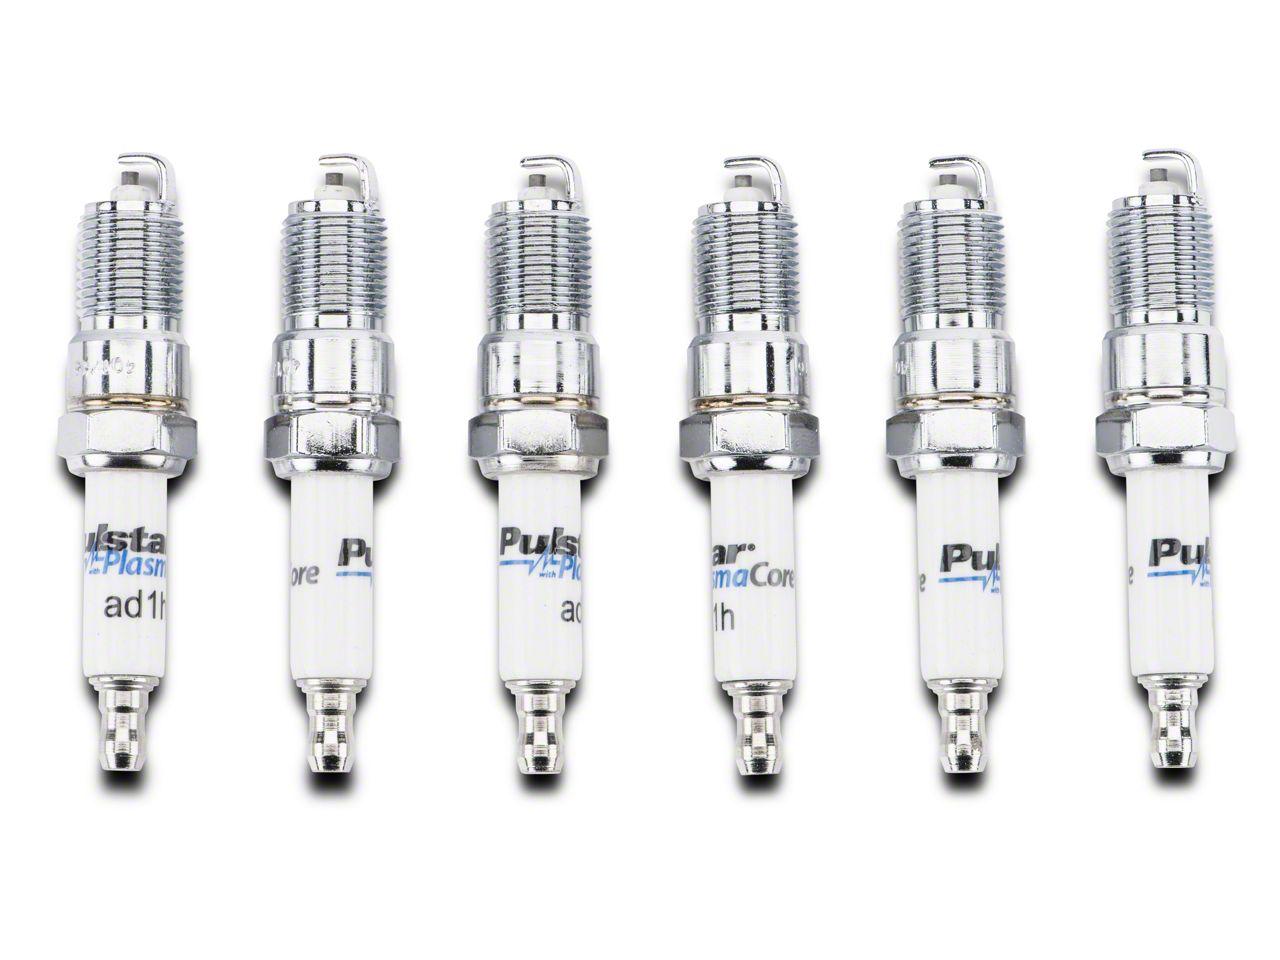 PlasmaCore Spark Plugs (94-97 V6; 99-10 V6)